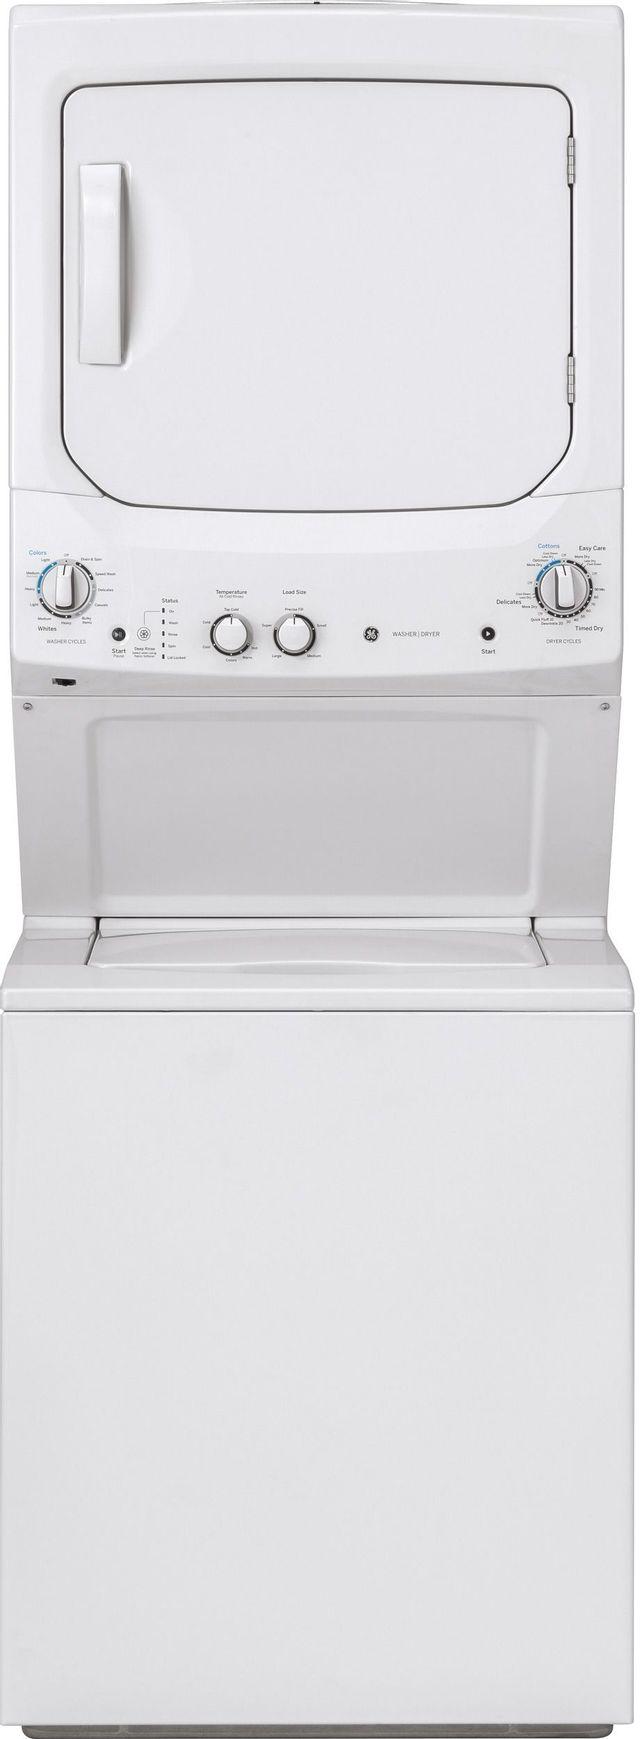 GE® Stack Laundry-White on White-GUV27ESSMWW